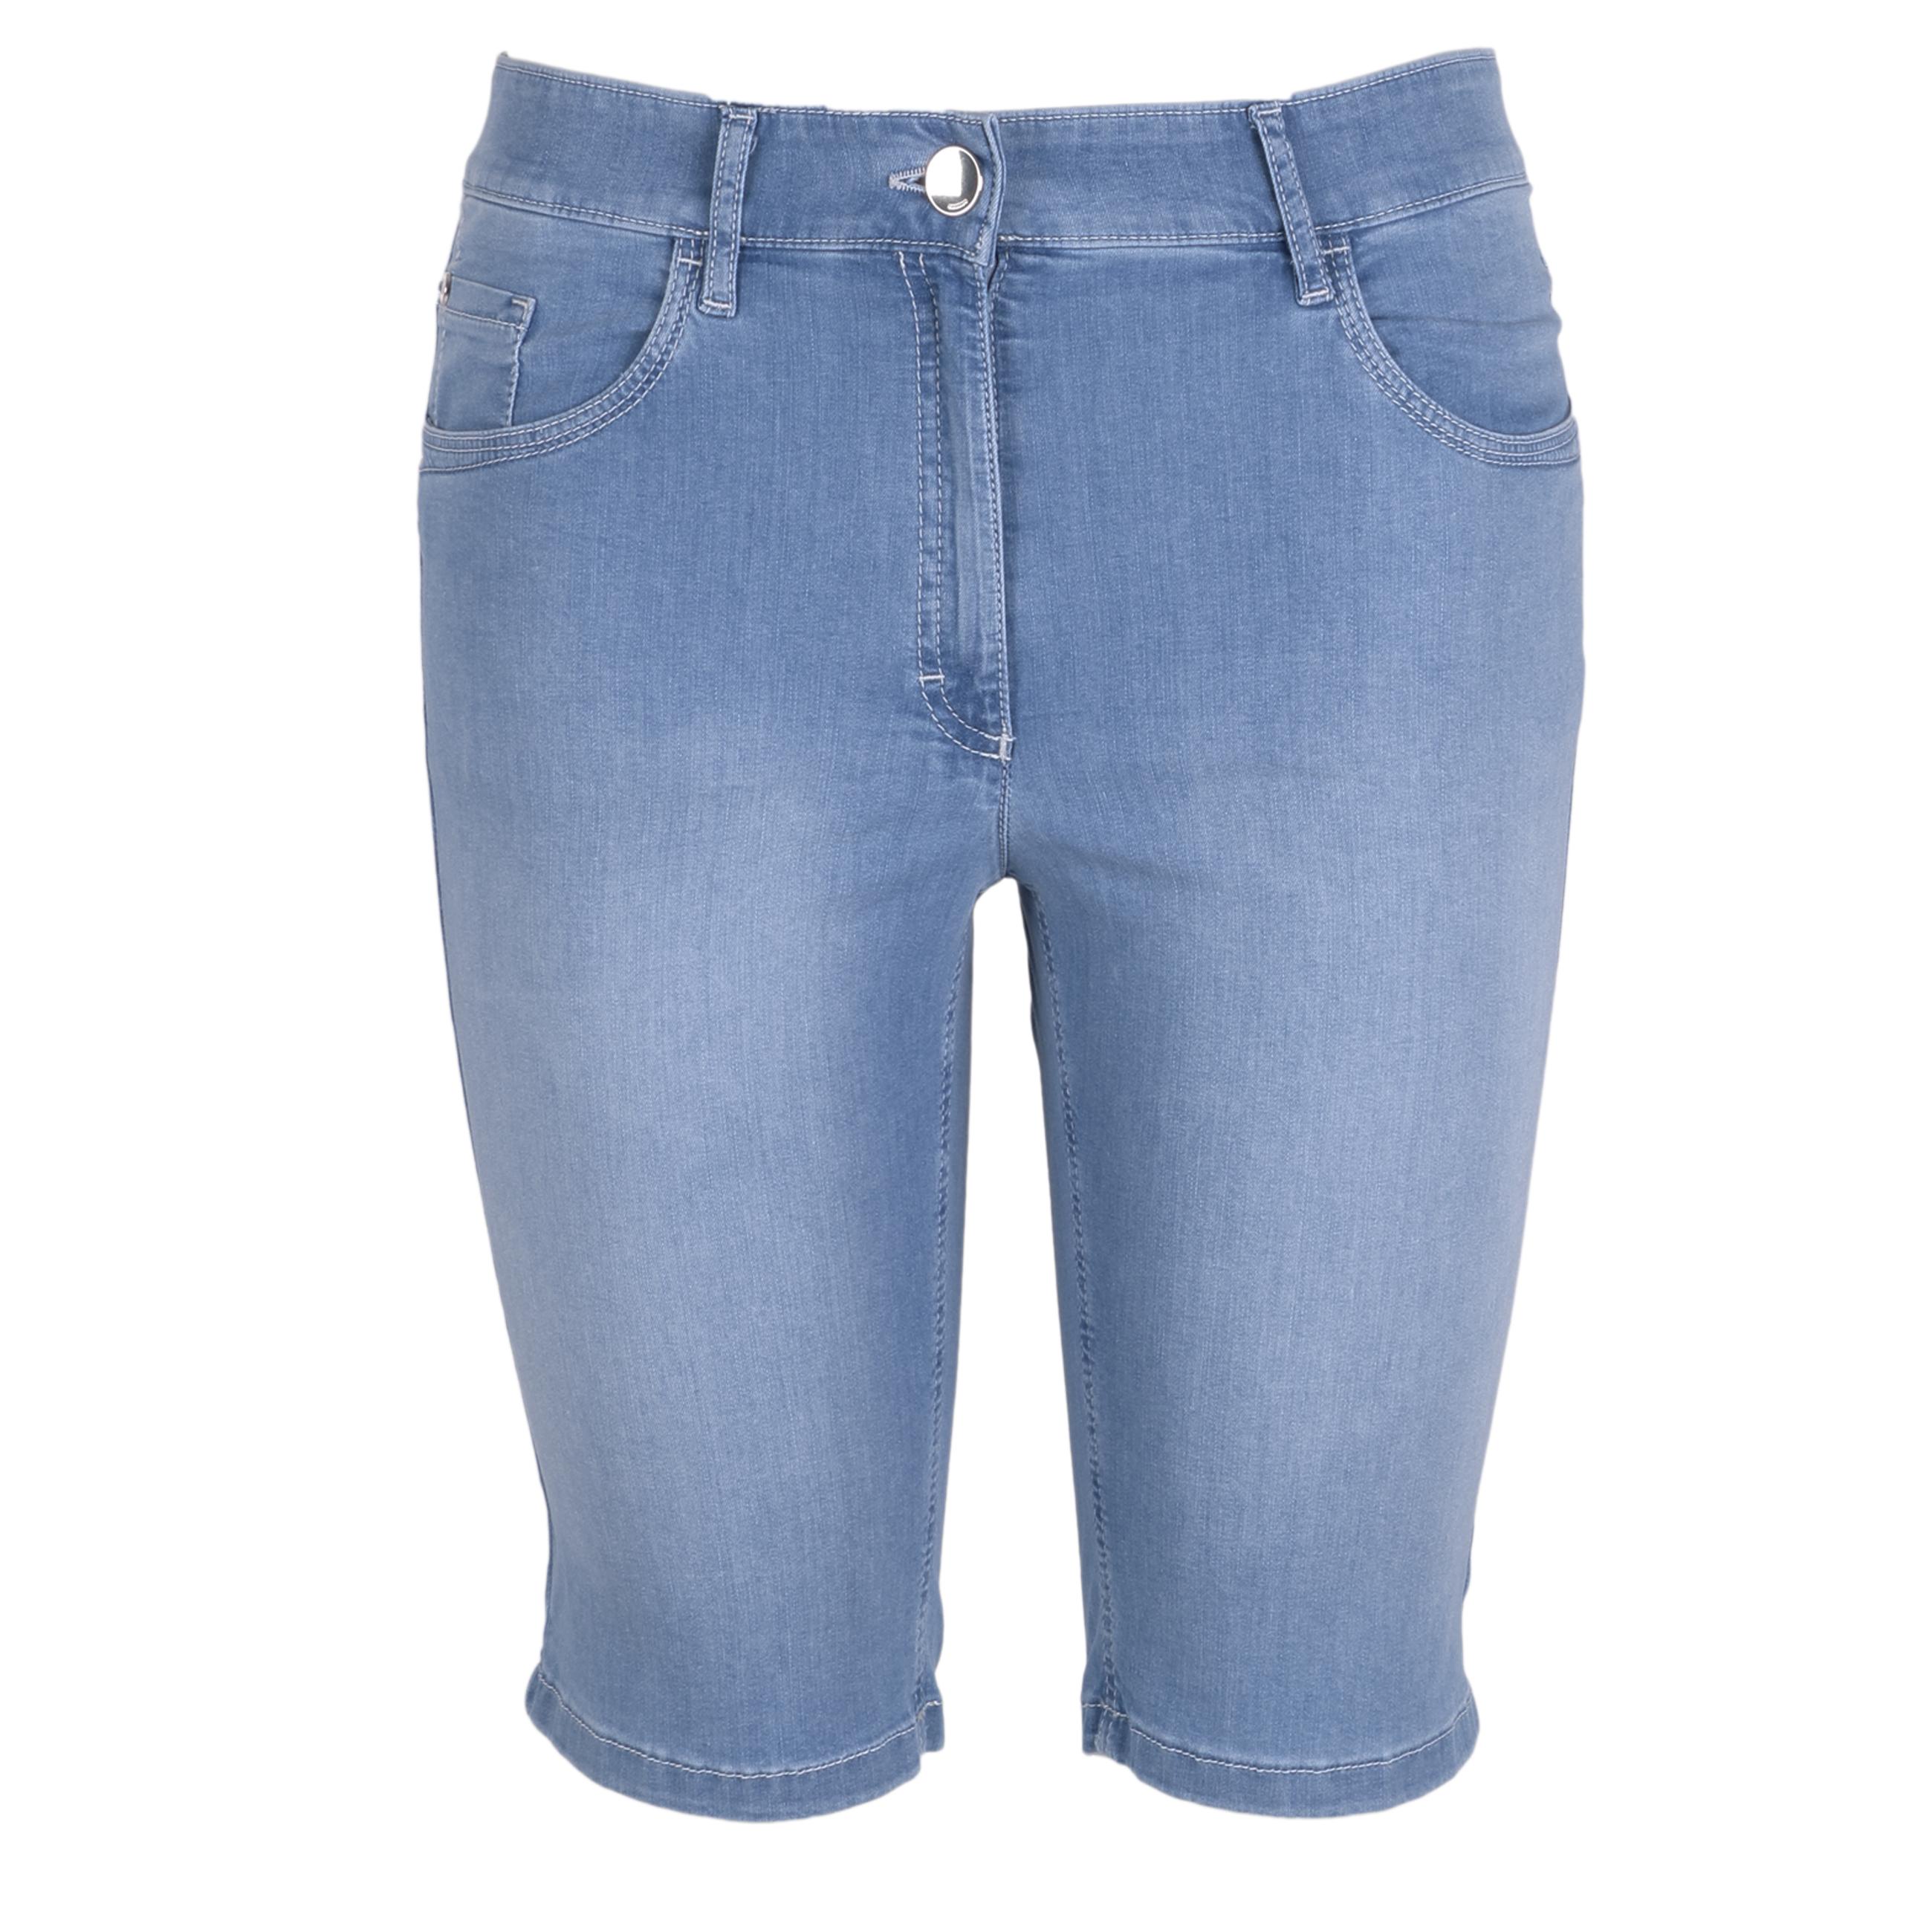 Zerres Damen Jeans Shorts Sarah